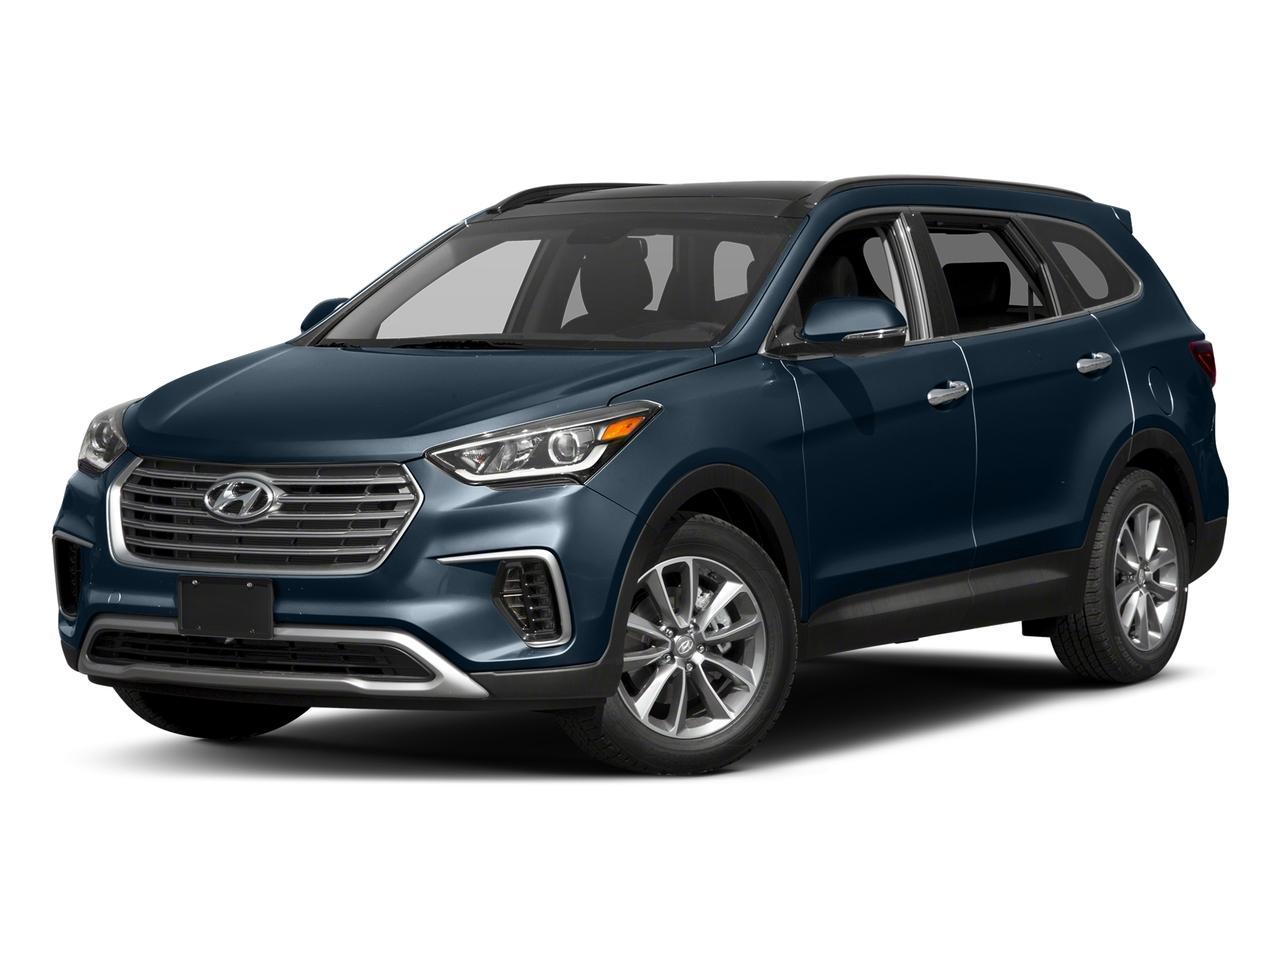 2018 Hyundai Santa Fe Vehicle Photo in Merrillville, IN 46410